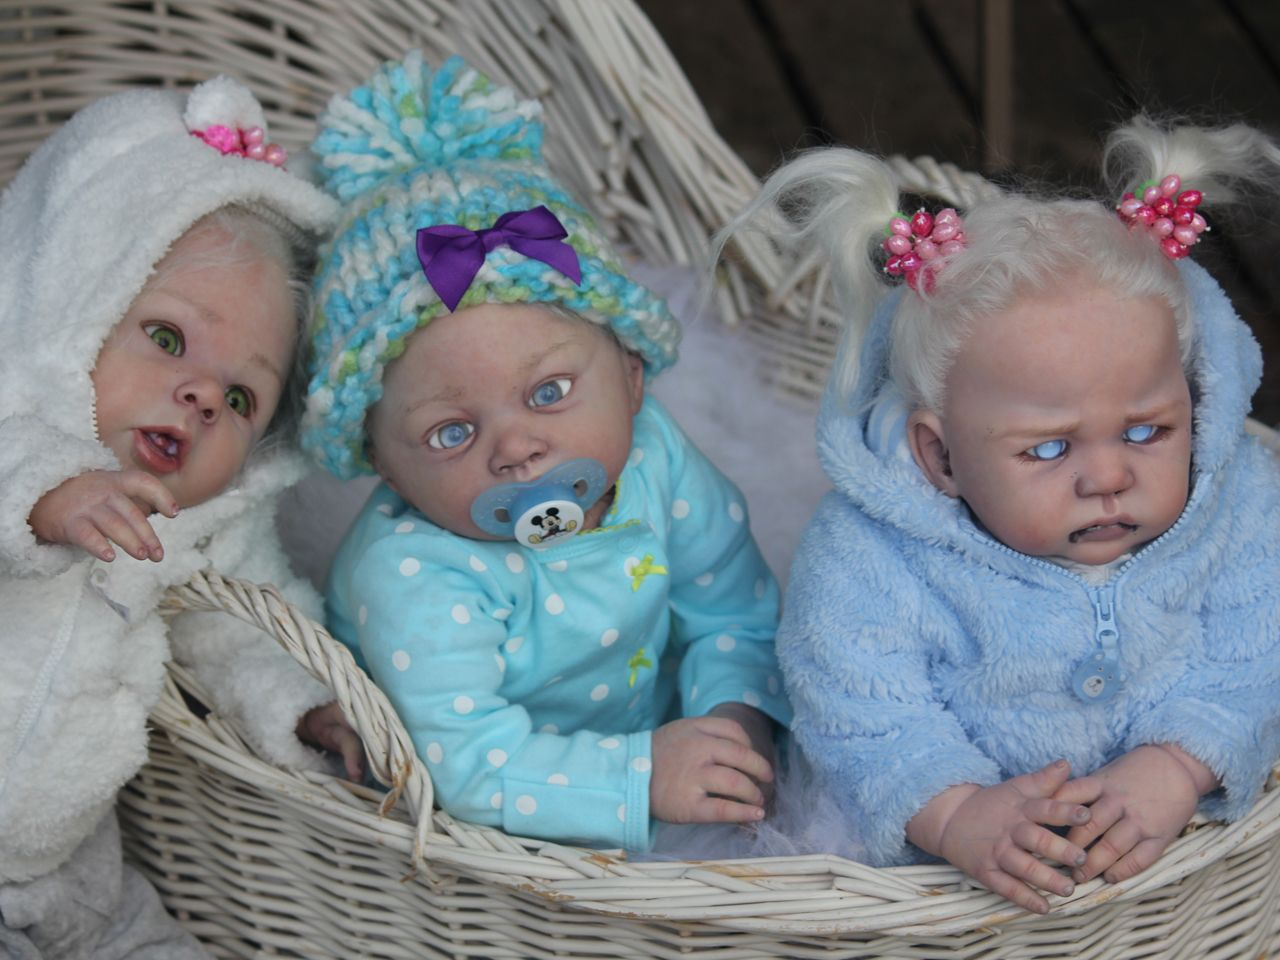 Look at those cute widdle fangs! Vampire, zombie 'reborn' dolls ...